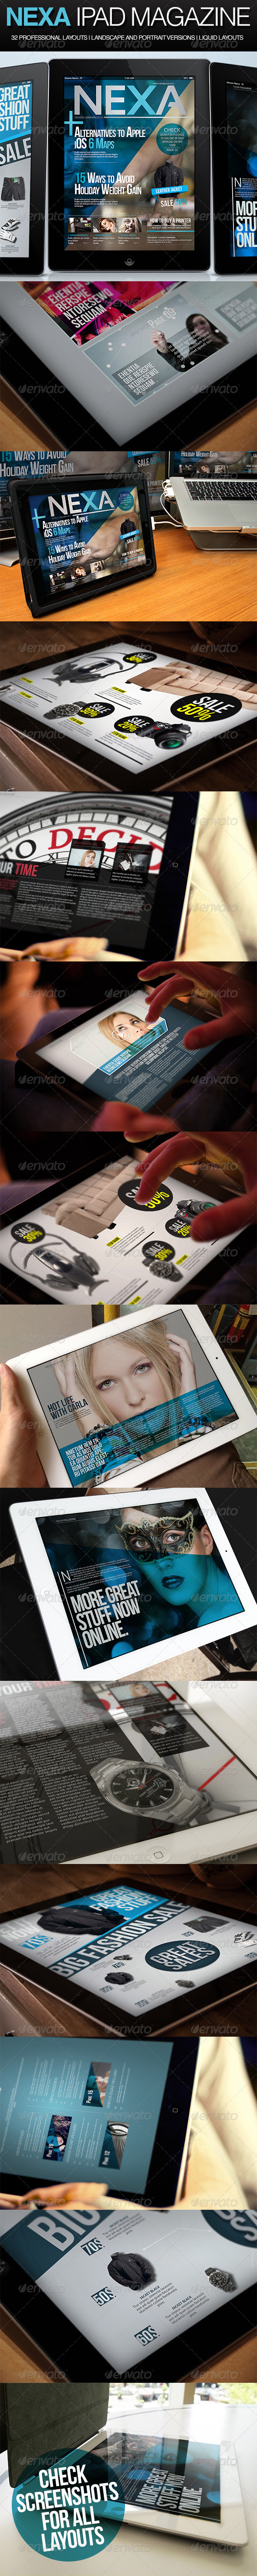 Nexa iPad Magazine - Magazines Print Templates